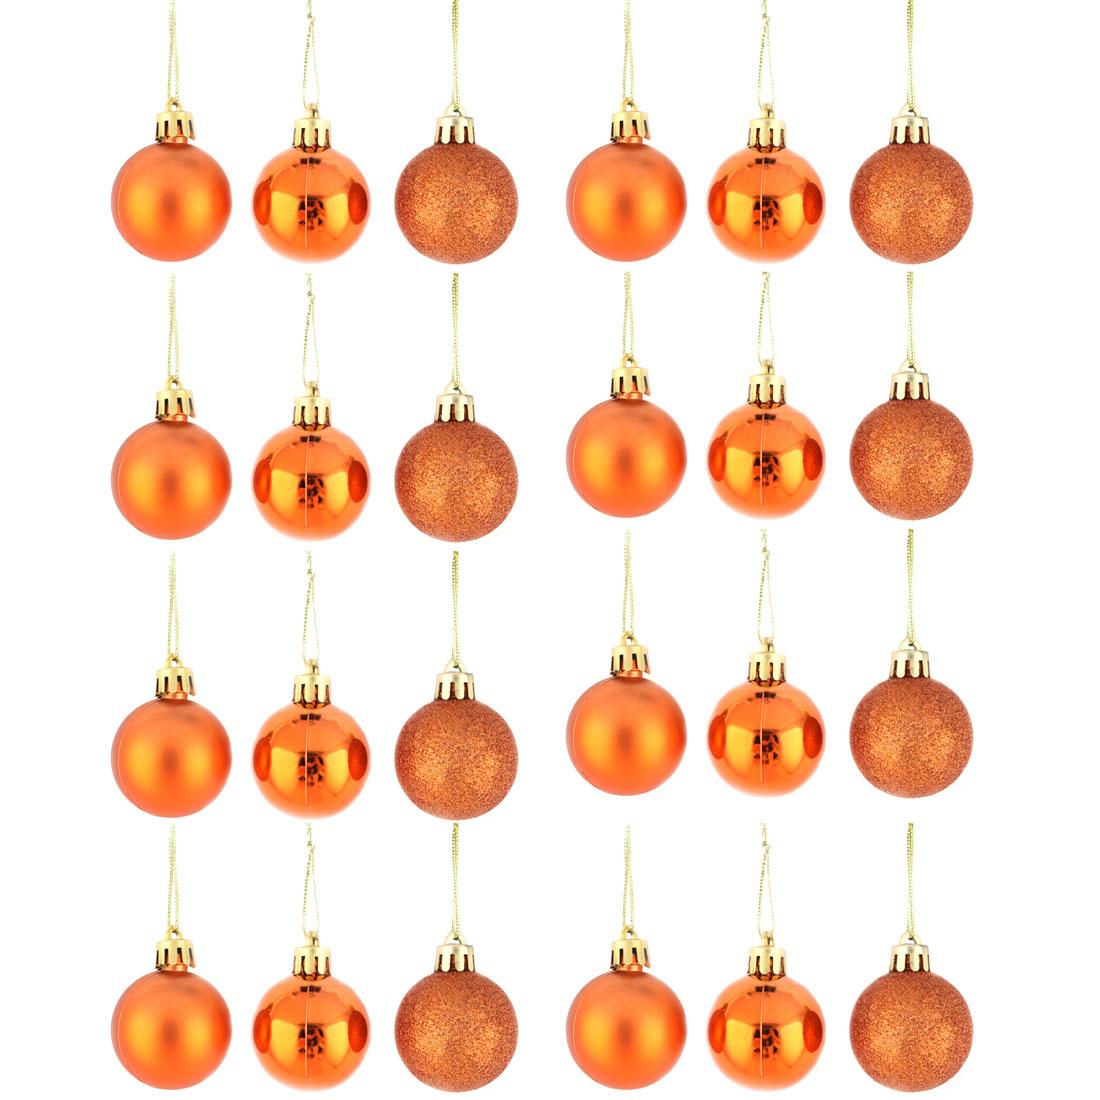 Holiday Christmas Party Plastic Pendant Tree Ornament Ball Orange 4cm Dia 24 Pcs